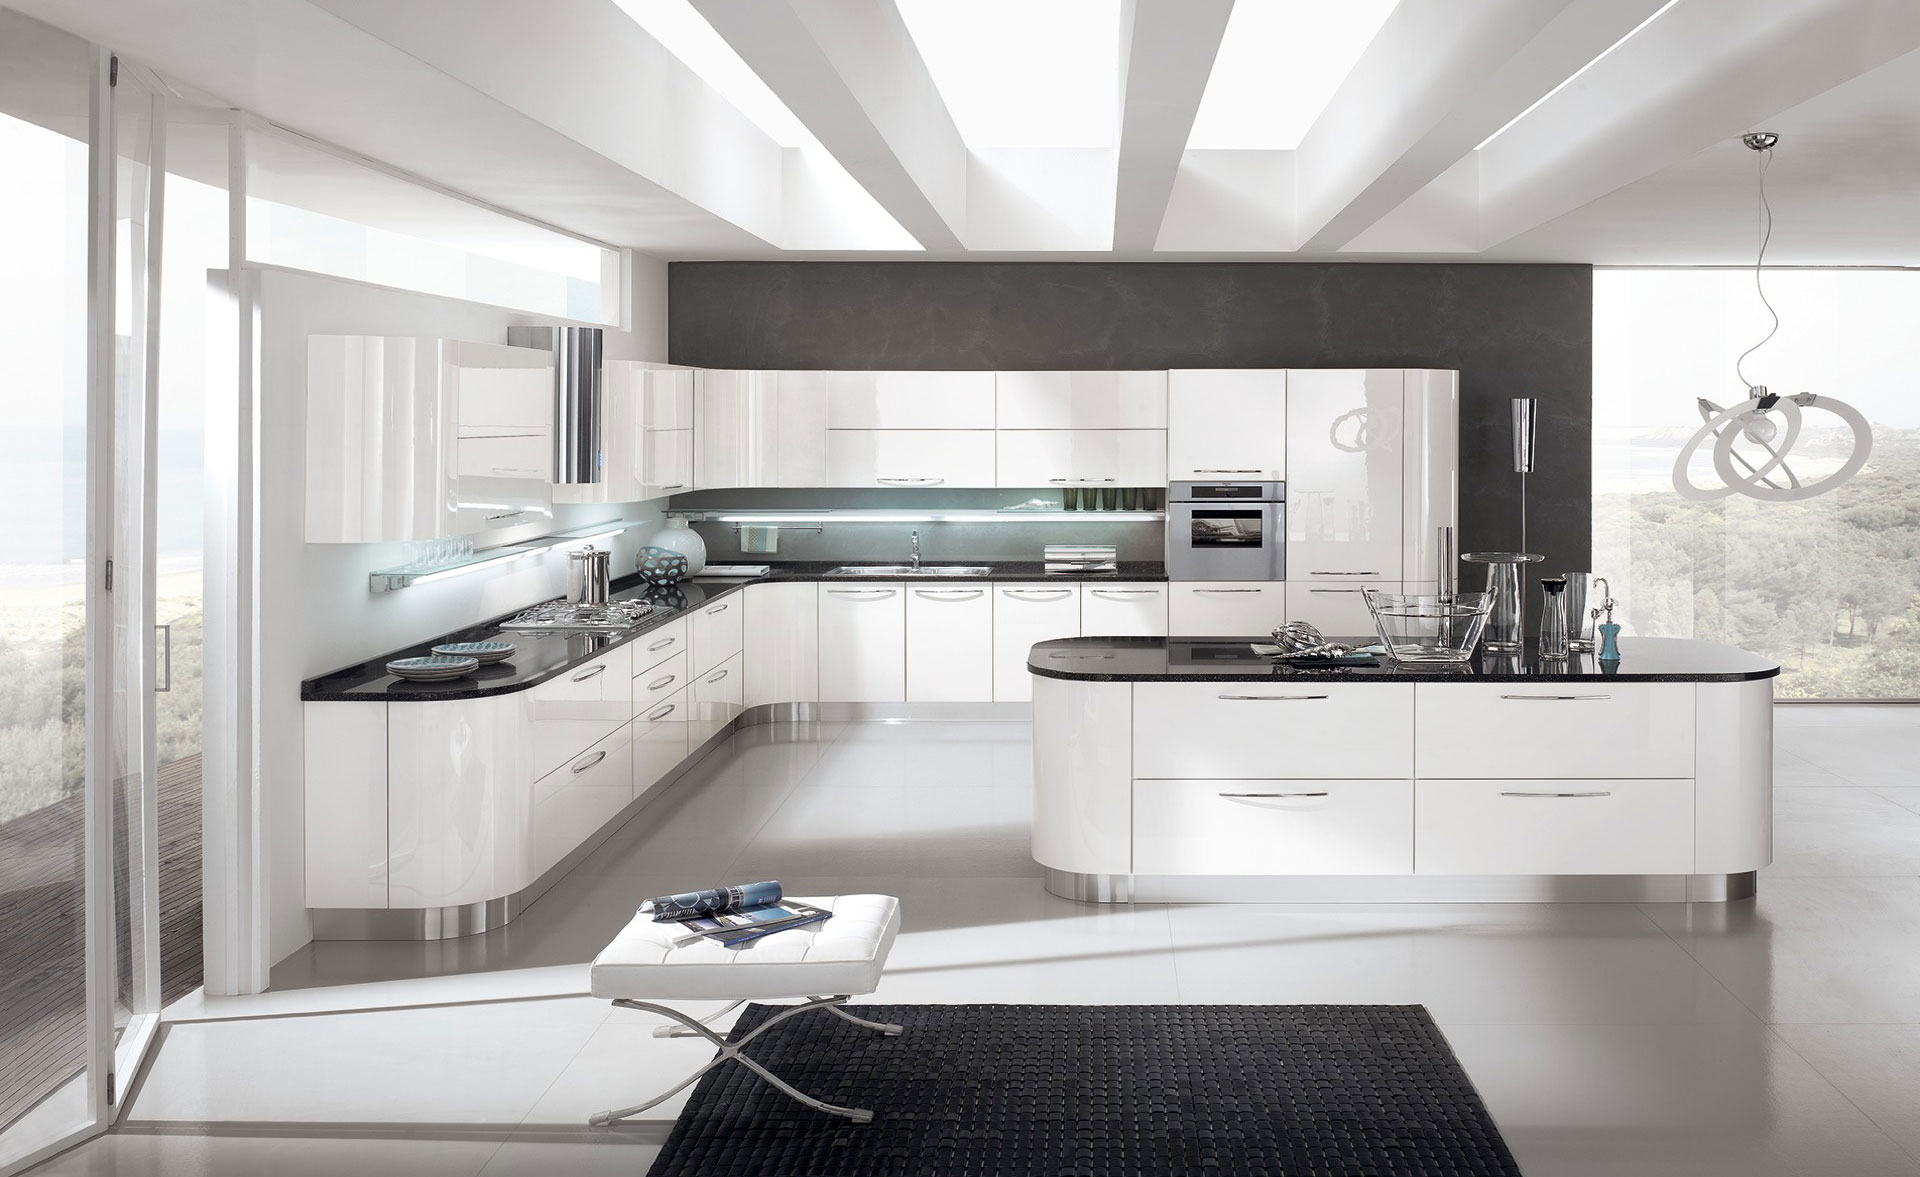 Beautiful Negri Arredamenti Cucine Gallery - Home Design - joygree.info